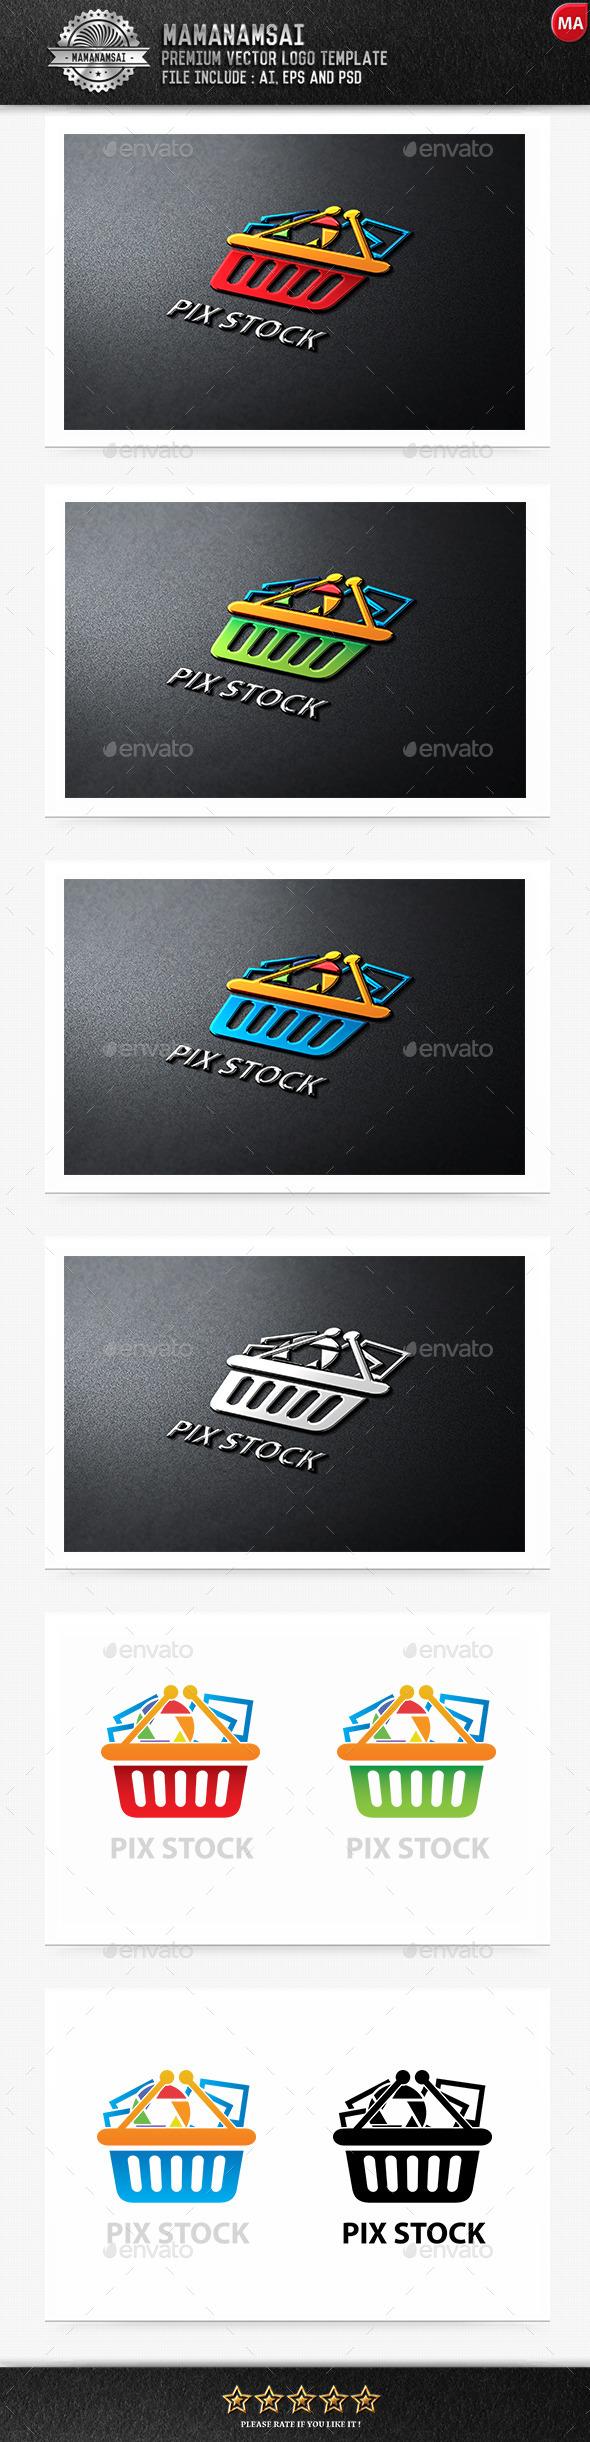 GraphicRiver Pix Stock Logo 9581235